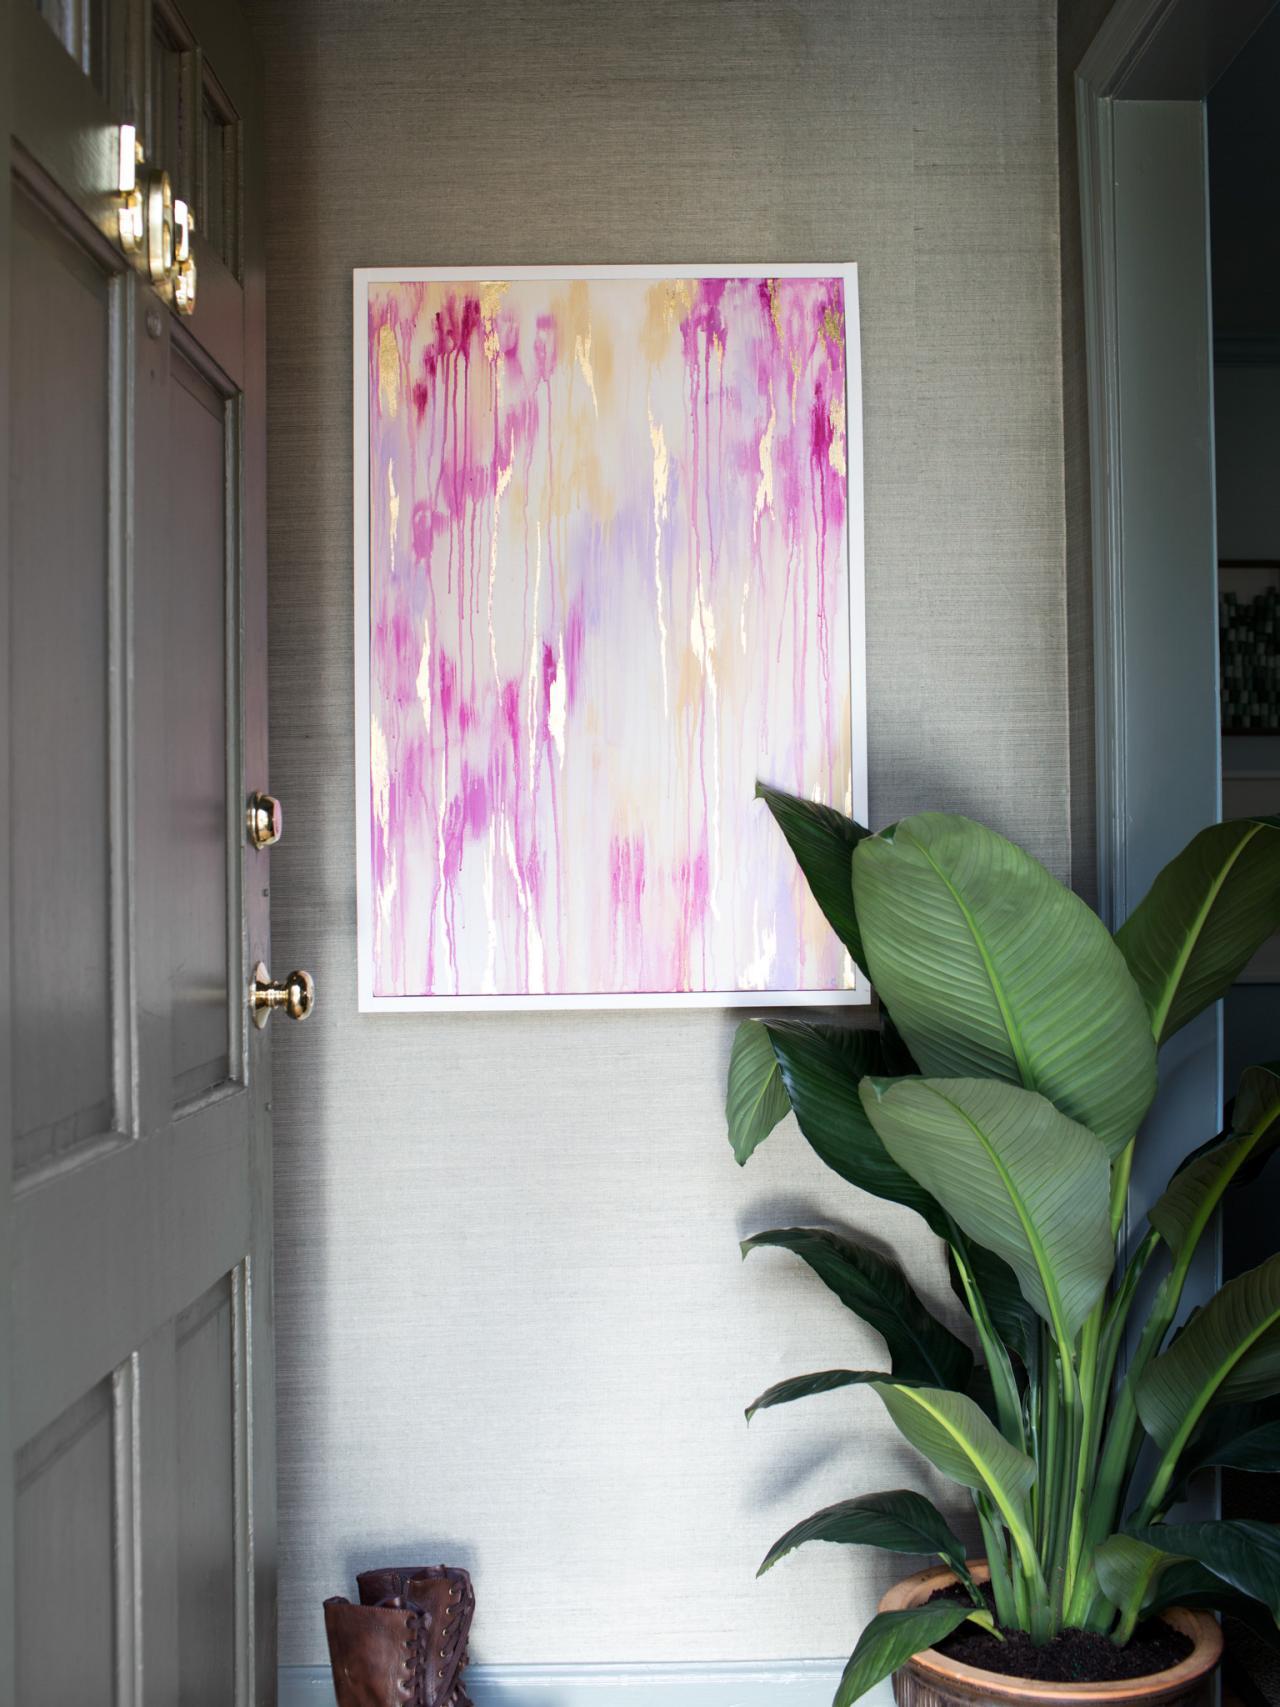 Canvas art ideas canvas wall art home wall decor ideas with canvas gold leafing with canvas art ideas solutioingenieria Image collections